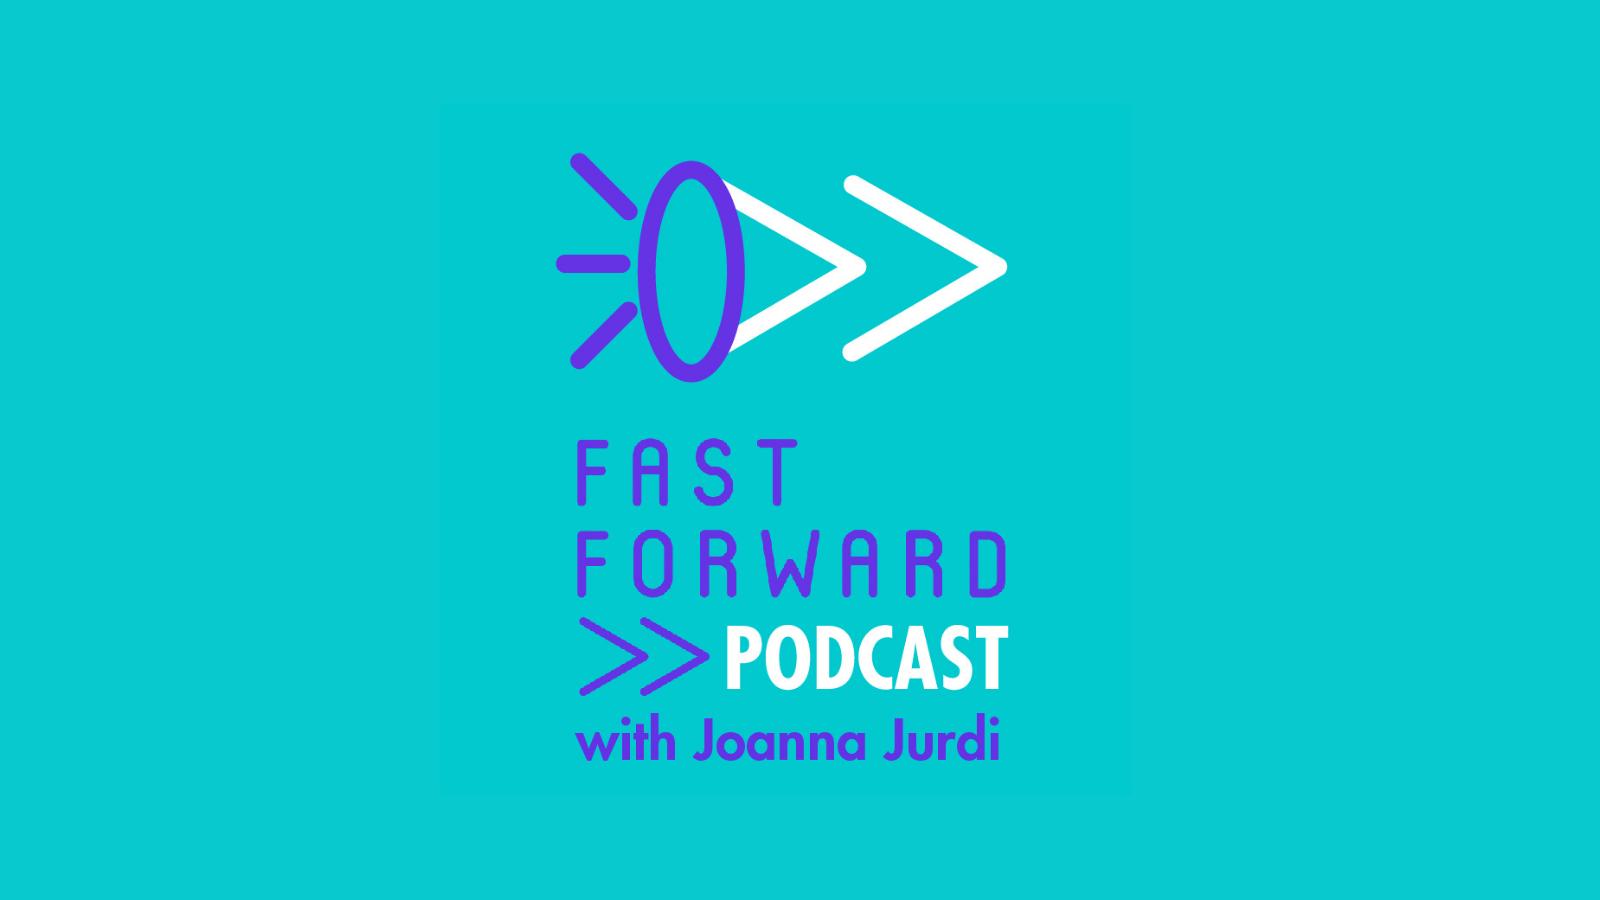 Fast Forward 2030 Podcast with Joana Jurdi